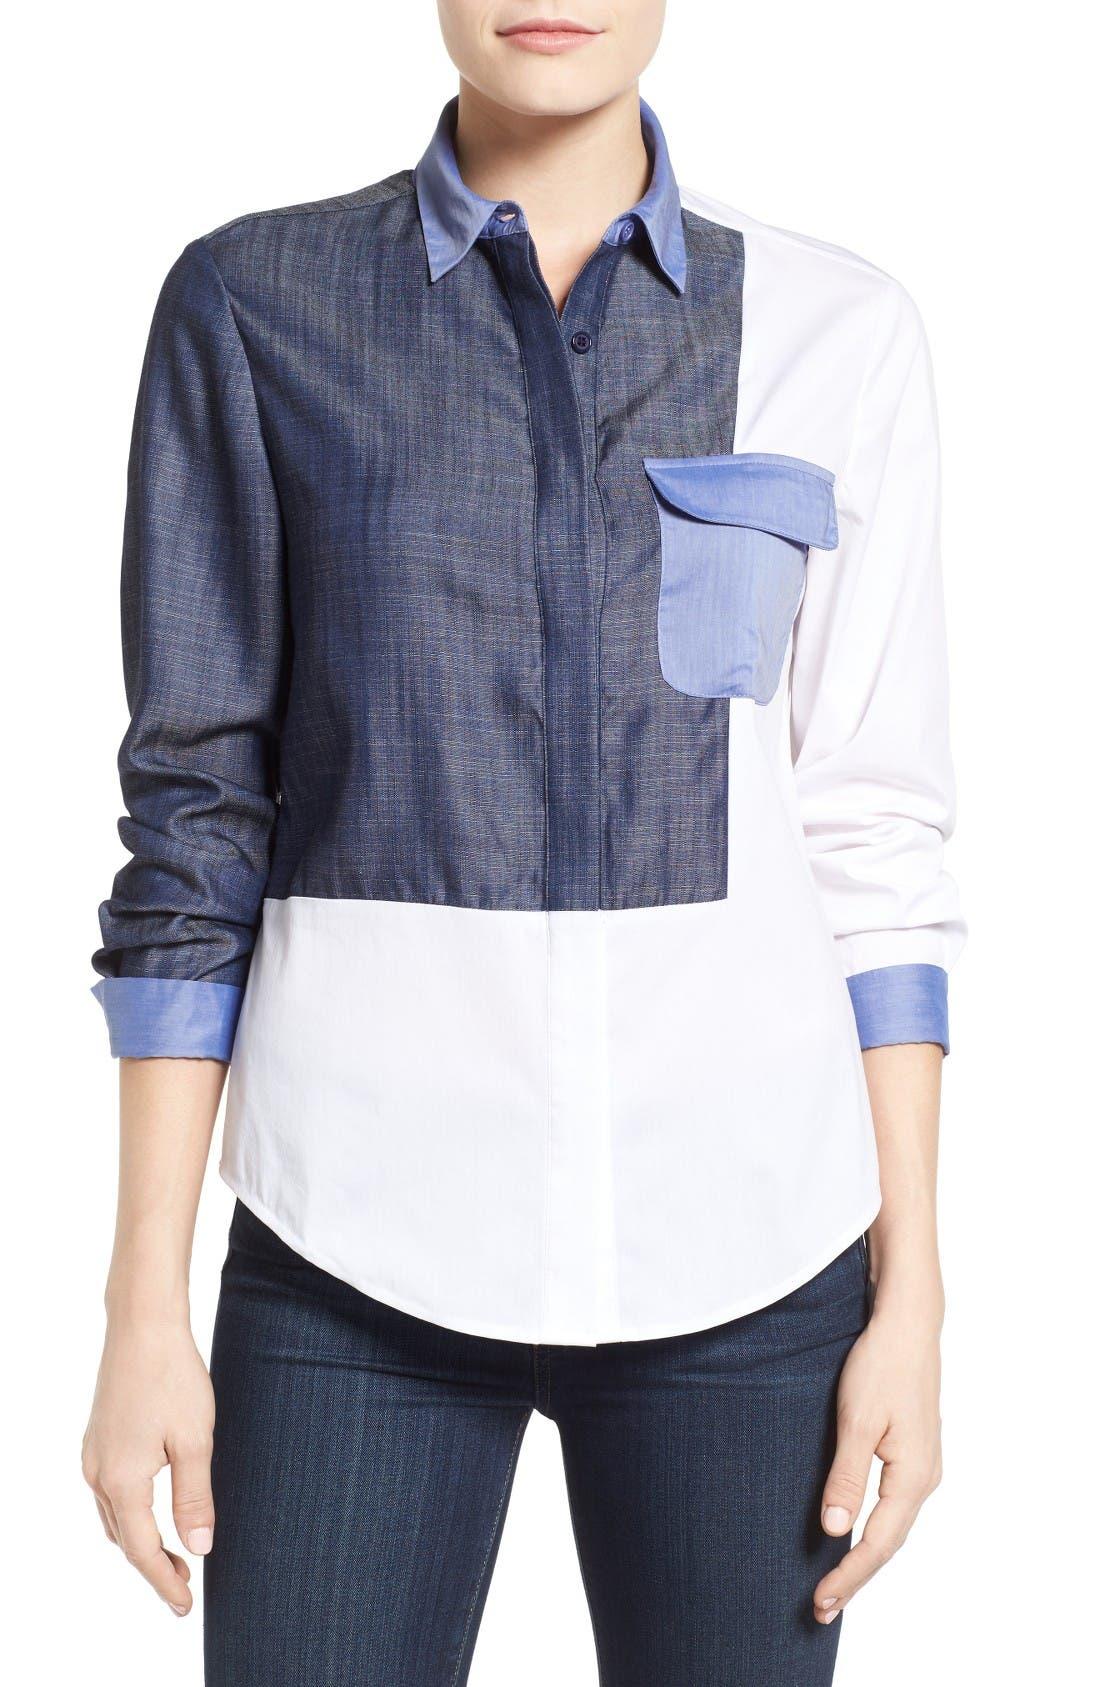 Alternate Image 1 Selected - Ivanka Trump Denim & Poplin Colorblock Shirt